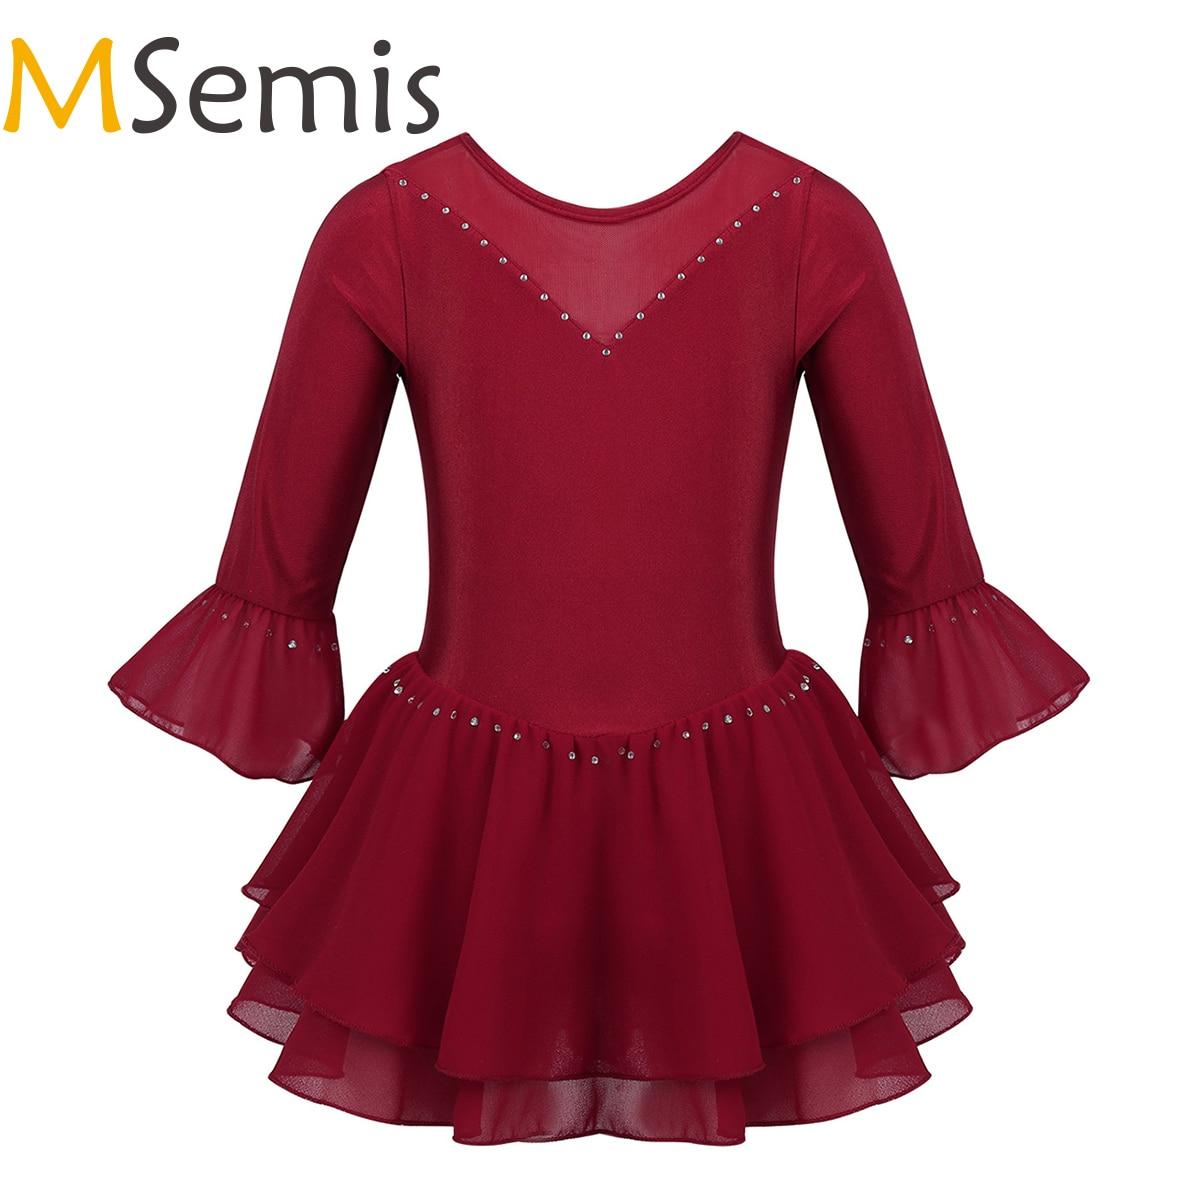 MSemis Kids Girls Figure Skating Dress Ice Skating Ballroom Competition Dresses Flare Sleeves Rhinestone Gymnastics Dancewear